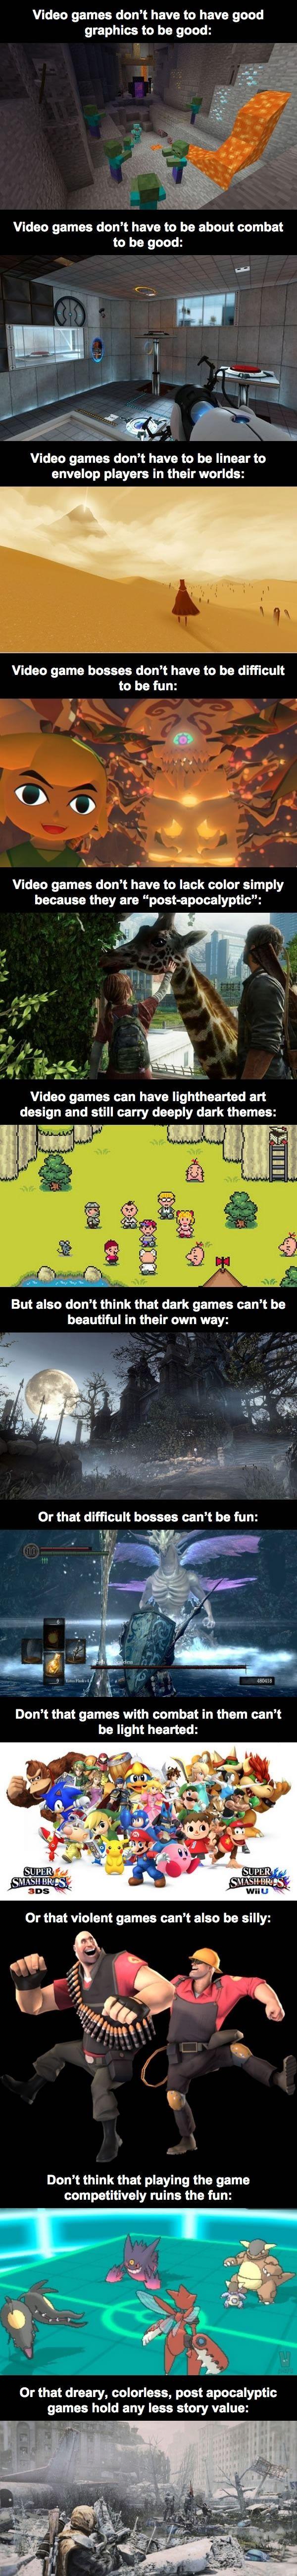 Rethink video games